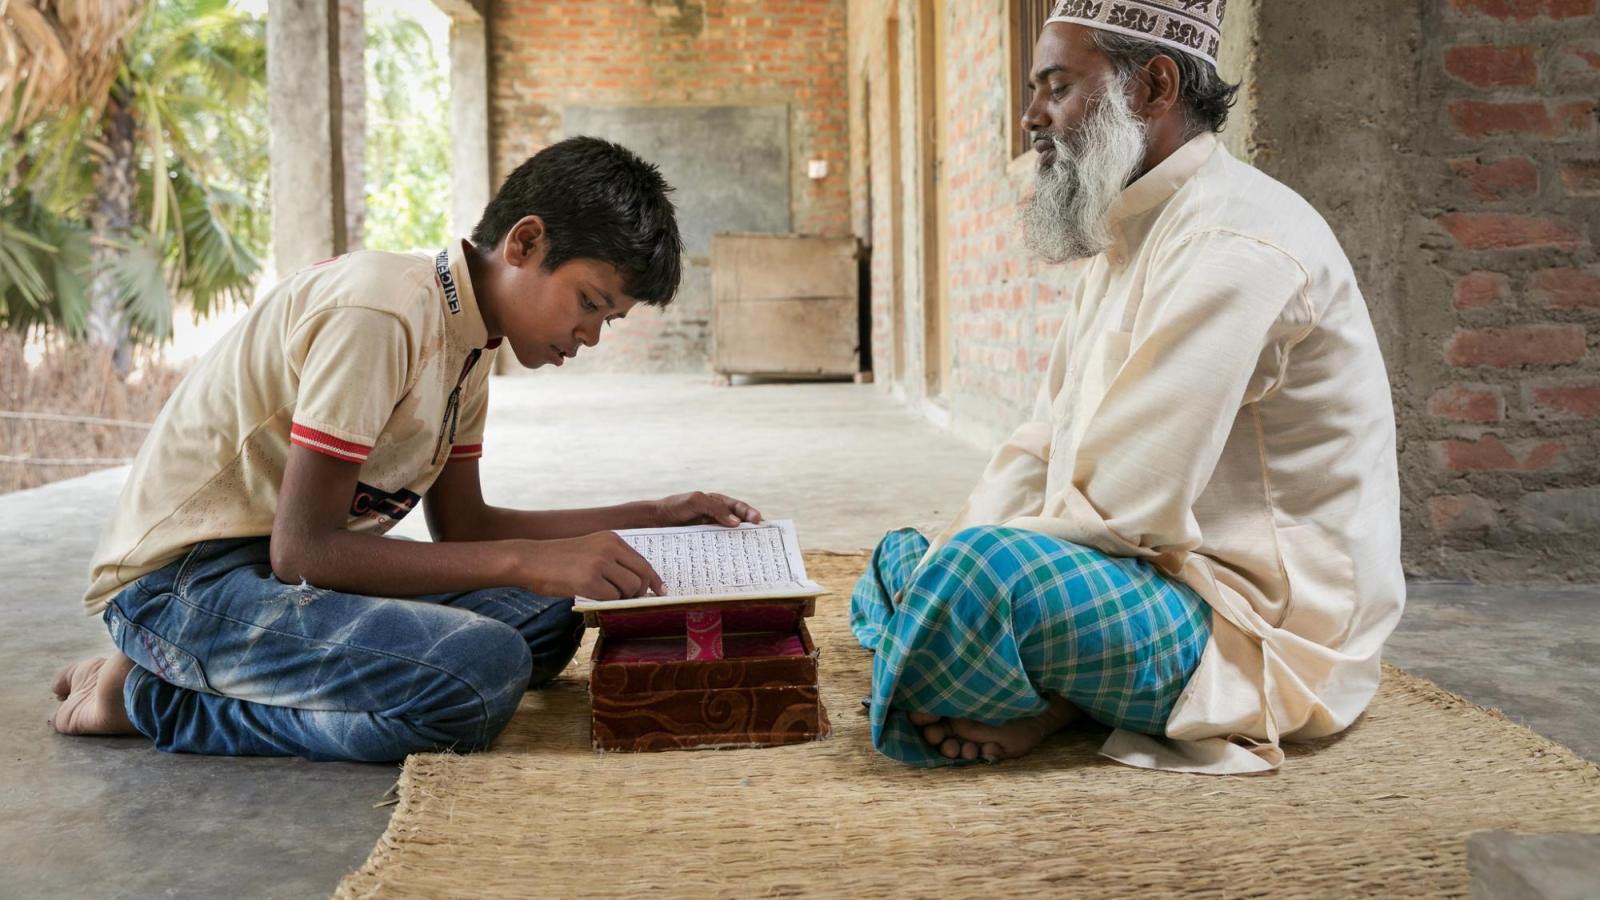 Teacher and Student Madrasa